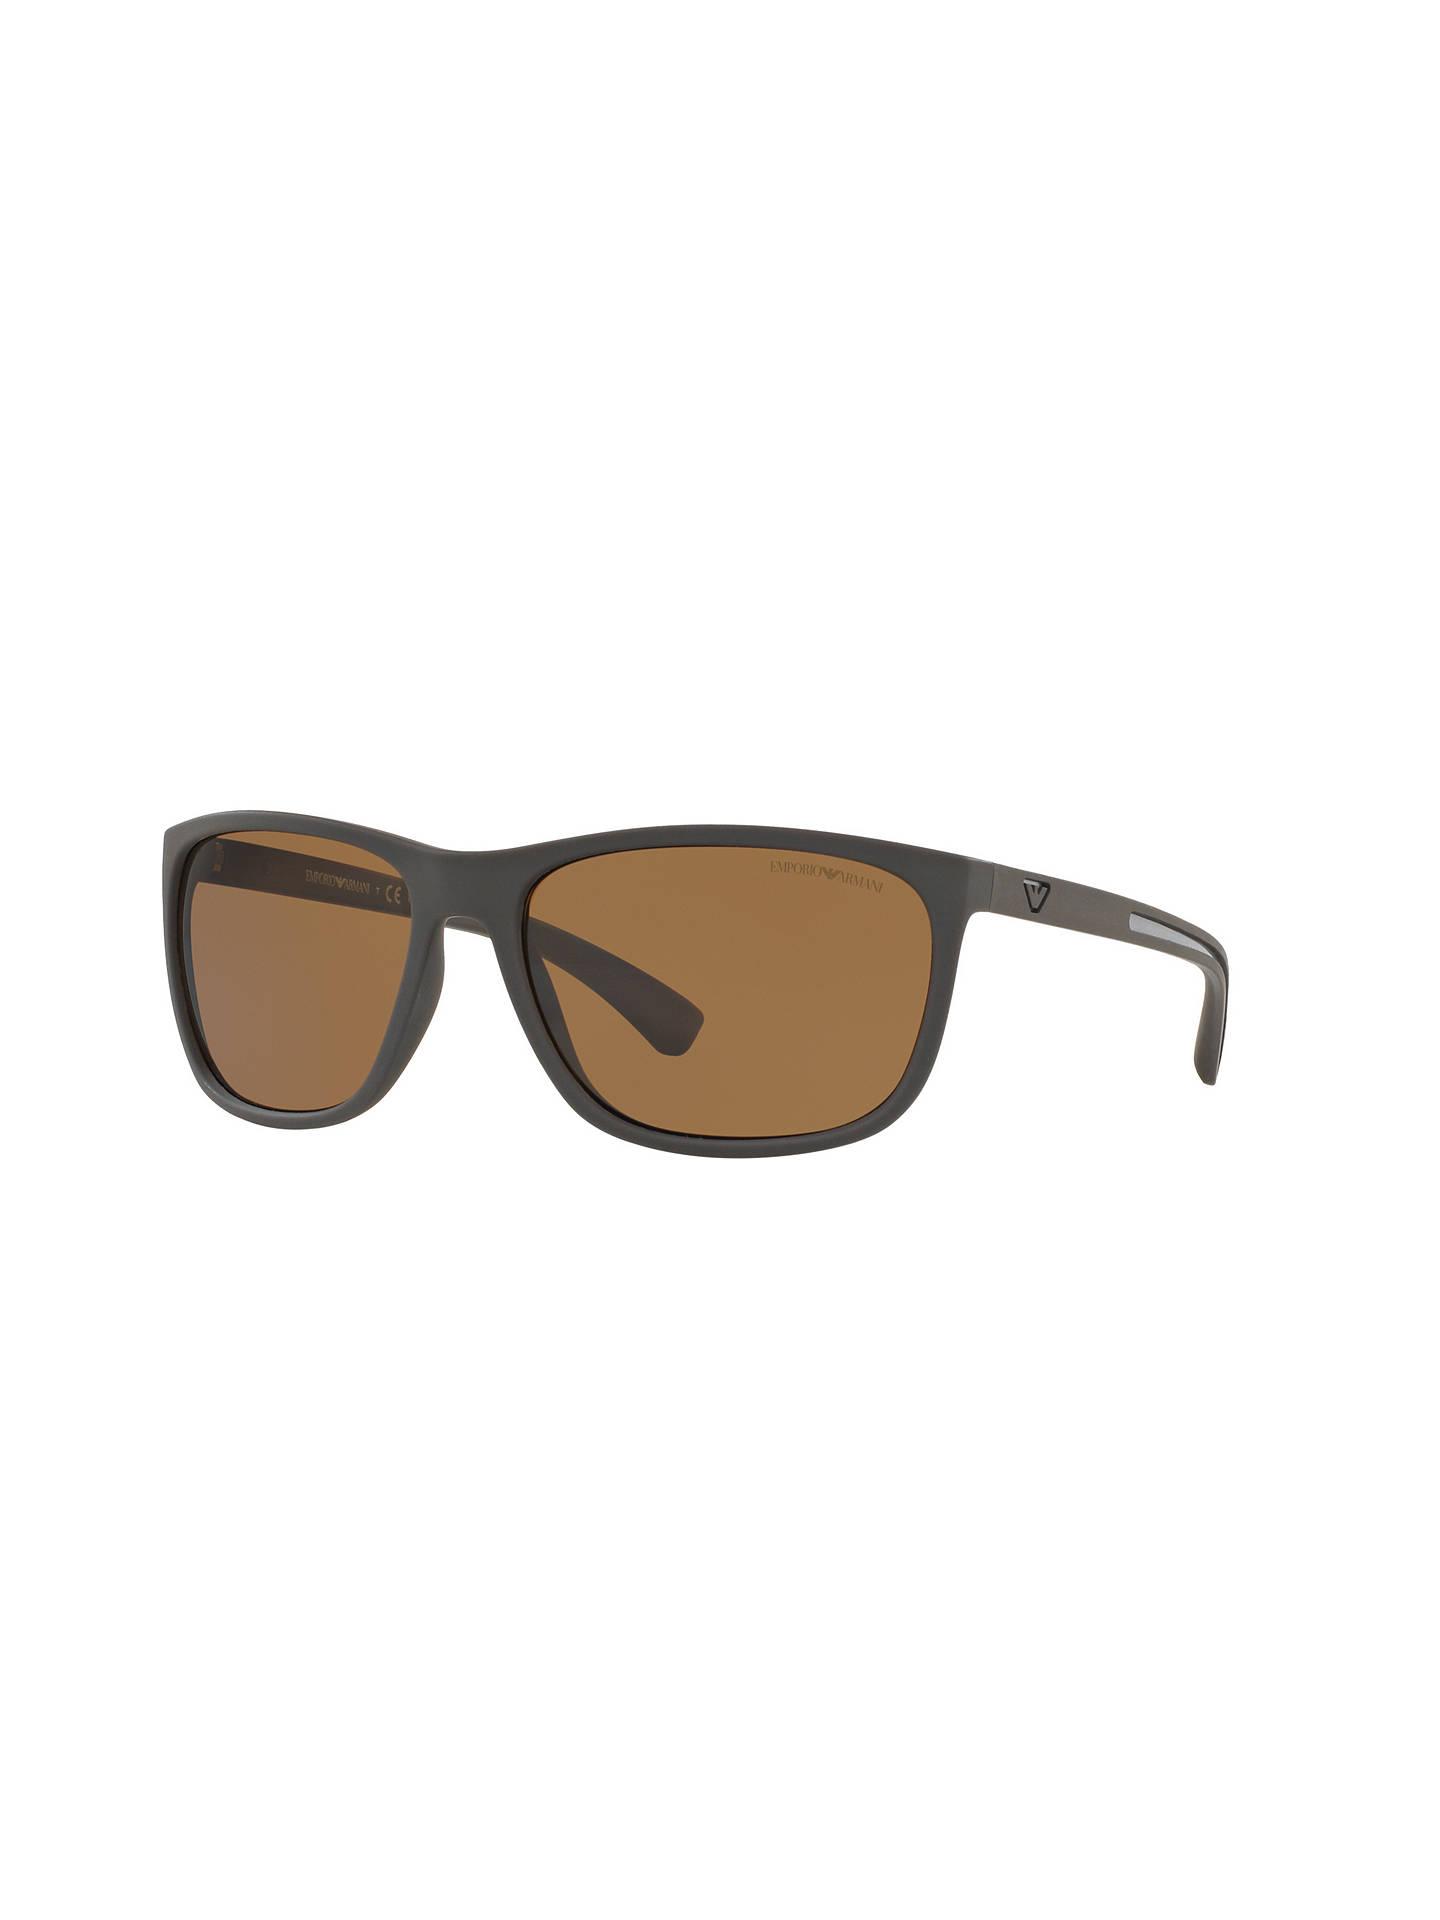 b19e6067513 Buy Emporio Armani EA4078 Polarised Rectangular Sunglasses